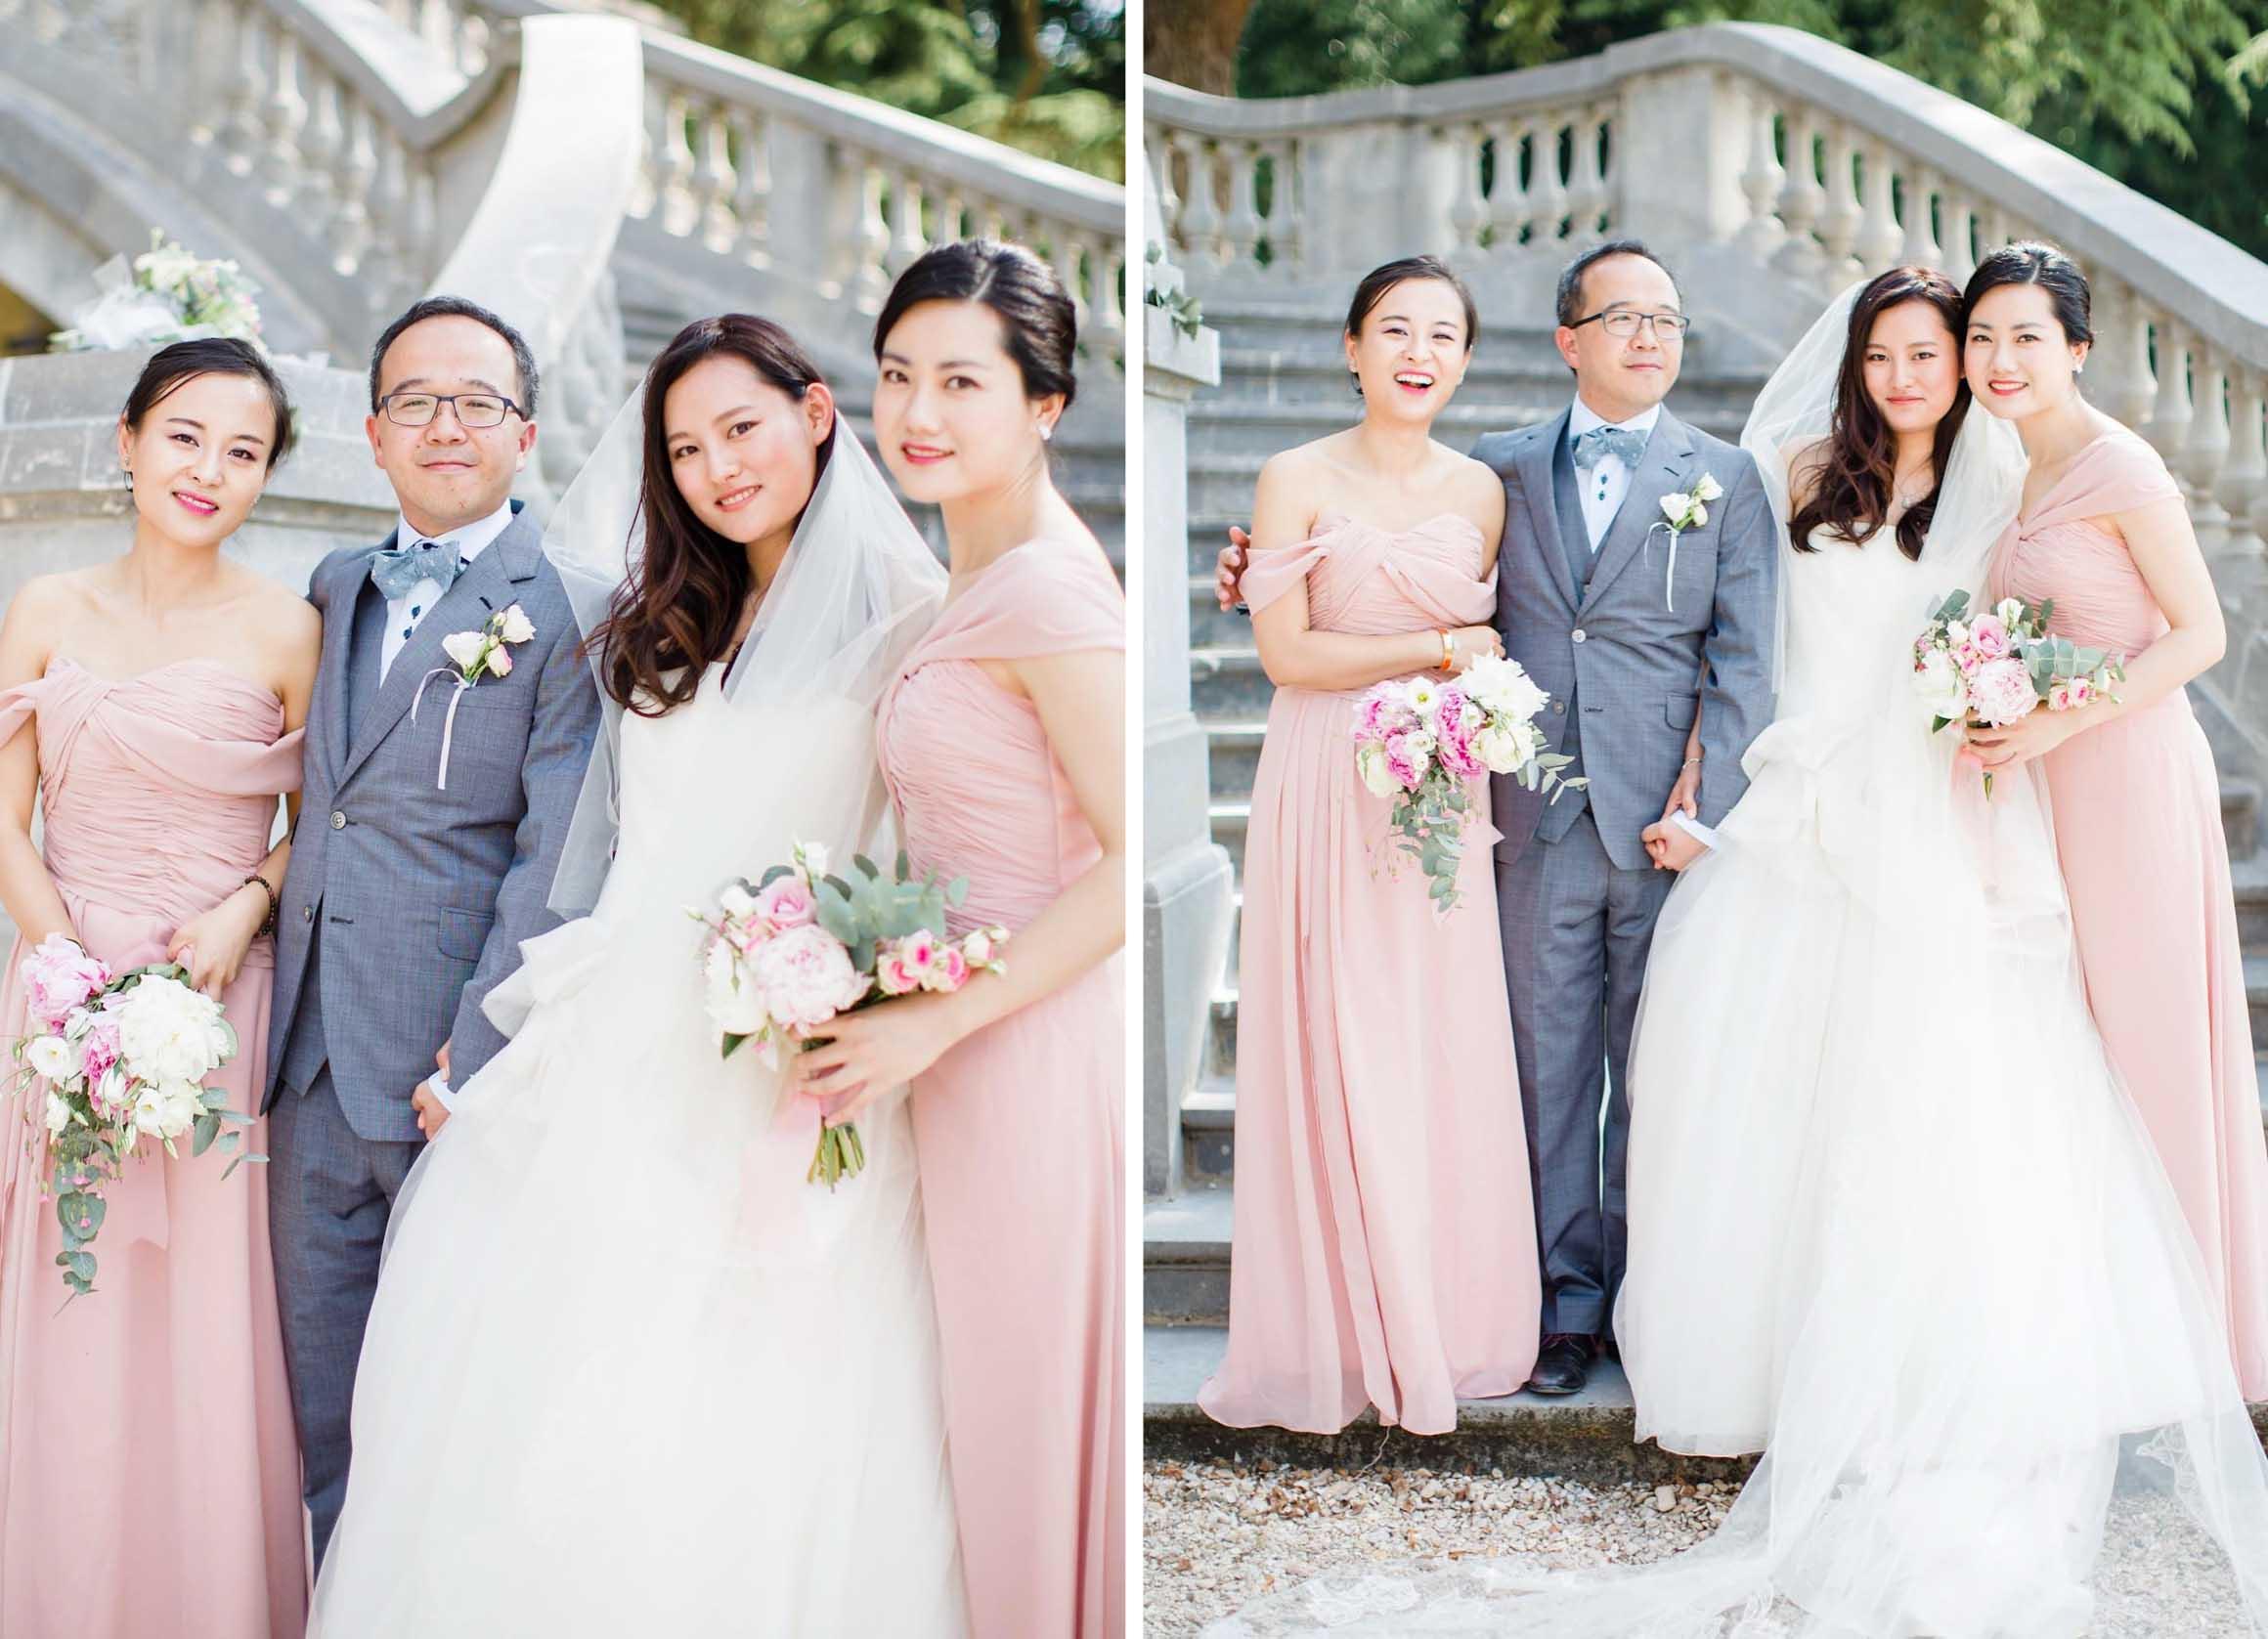 Amy O'Boyle Photography- Chateau Bouffemont Wedding- France Wedding Photographer 4.jpg